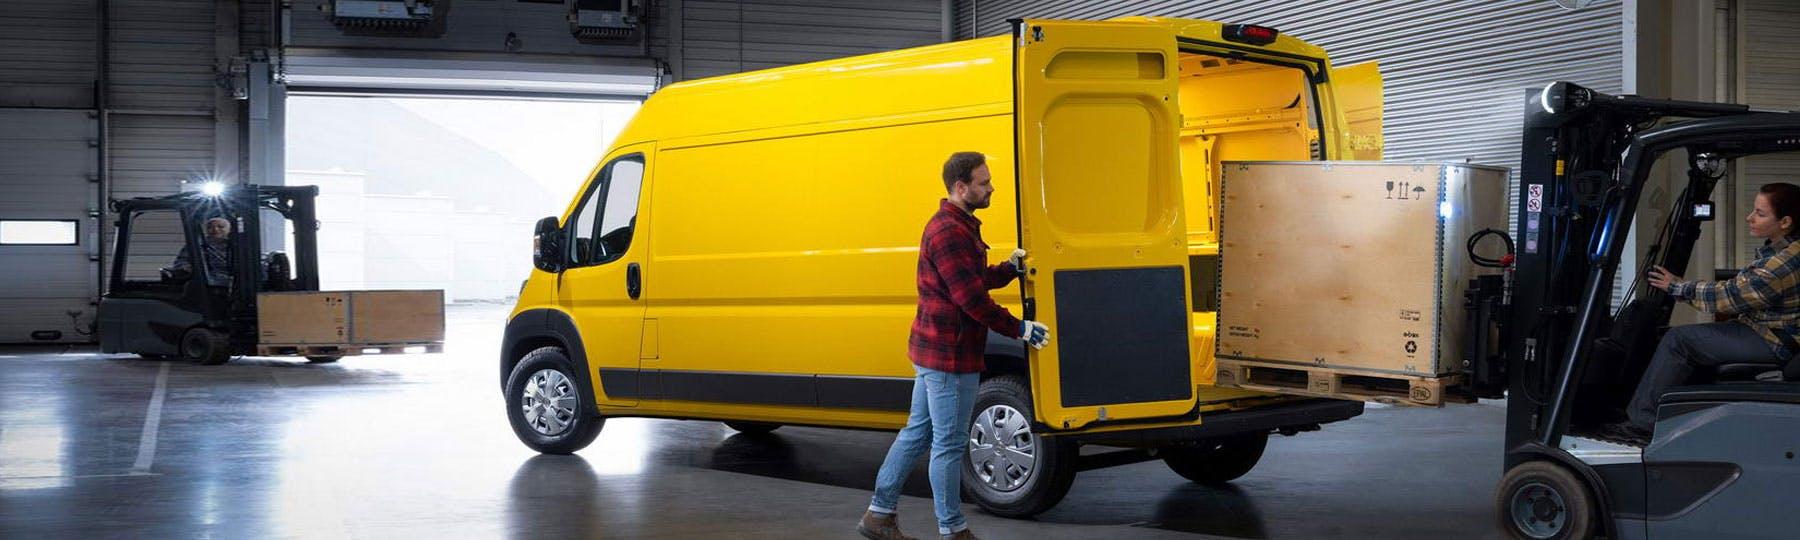 New Vauxhall Movano